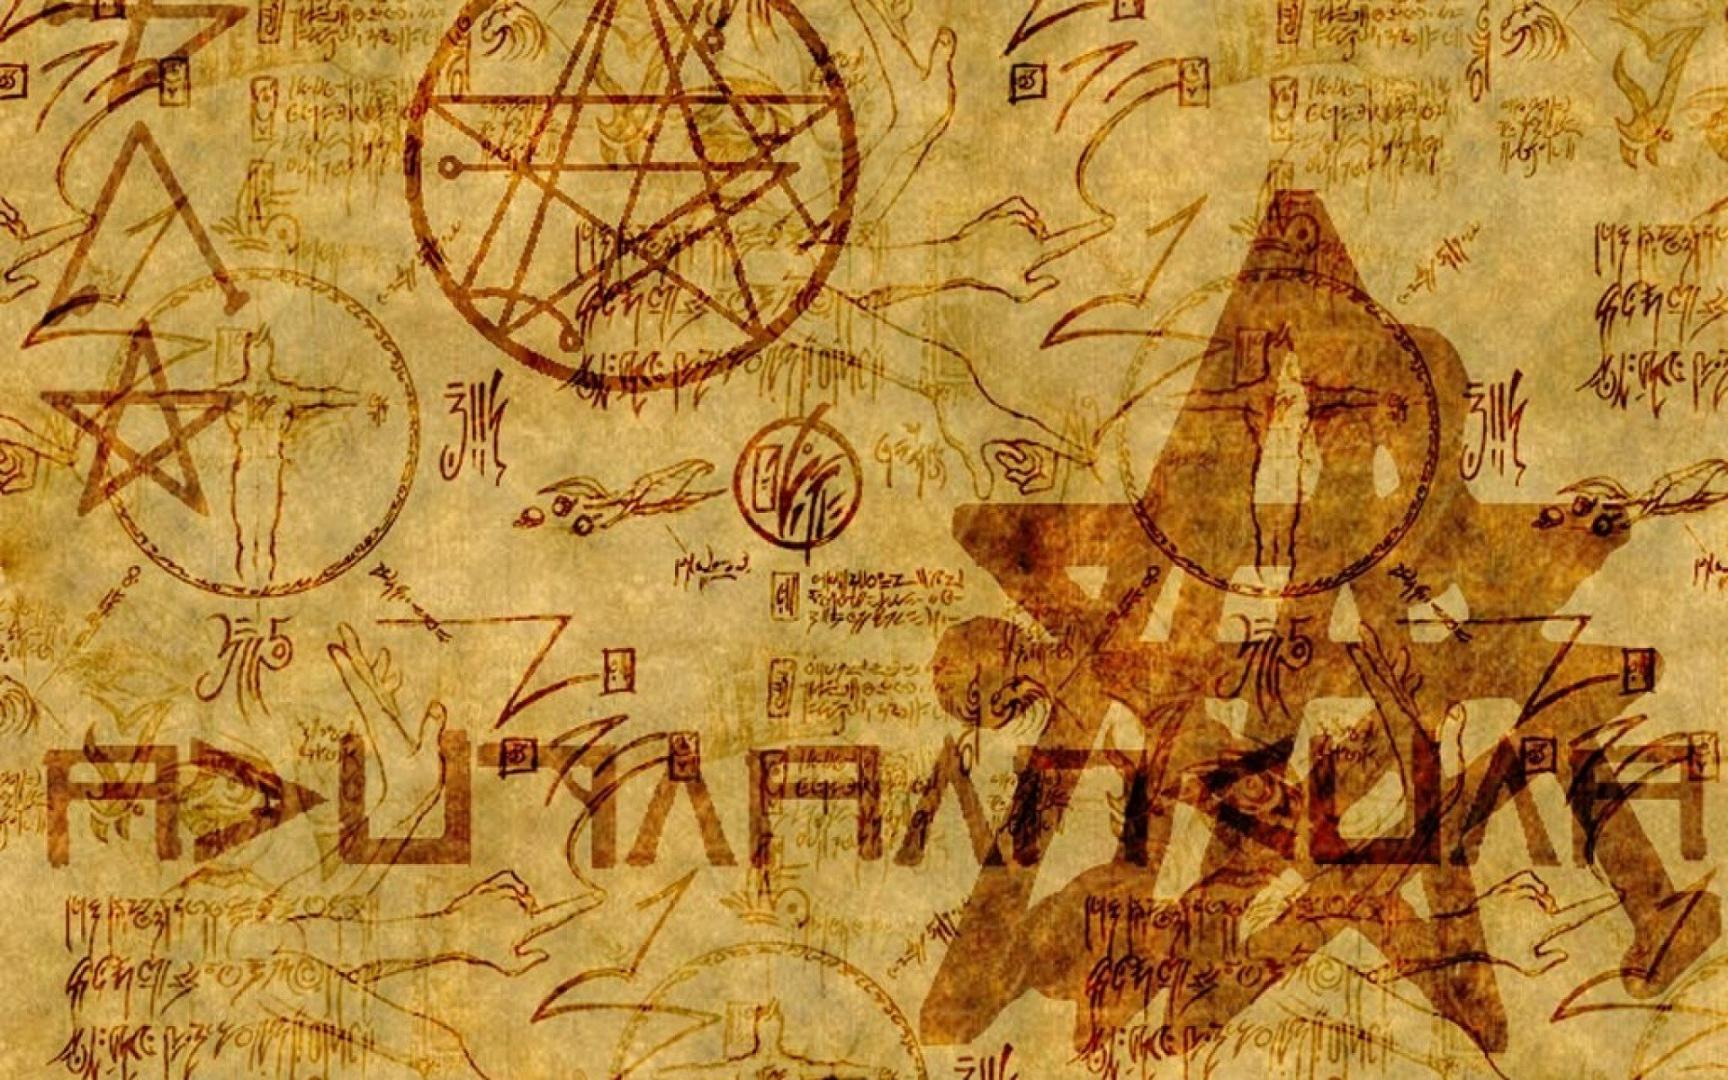 Közelgő Lovecraftiánus videójátékok